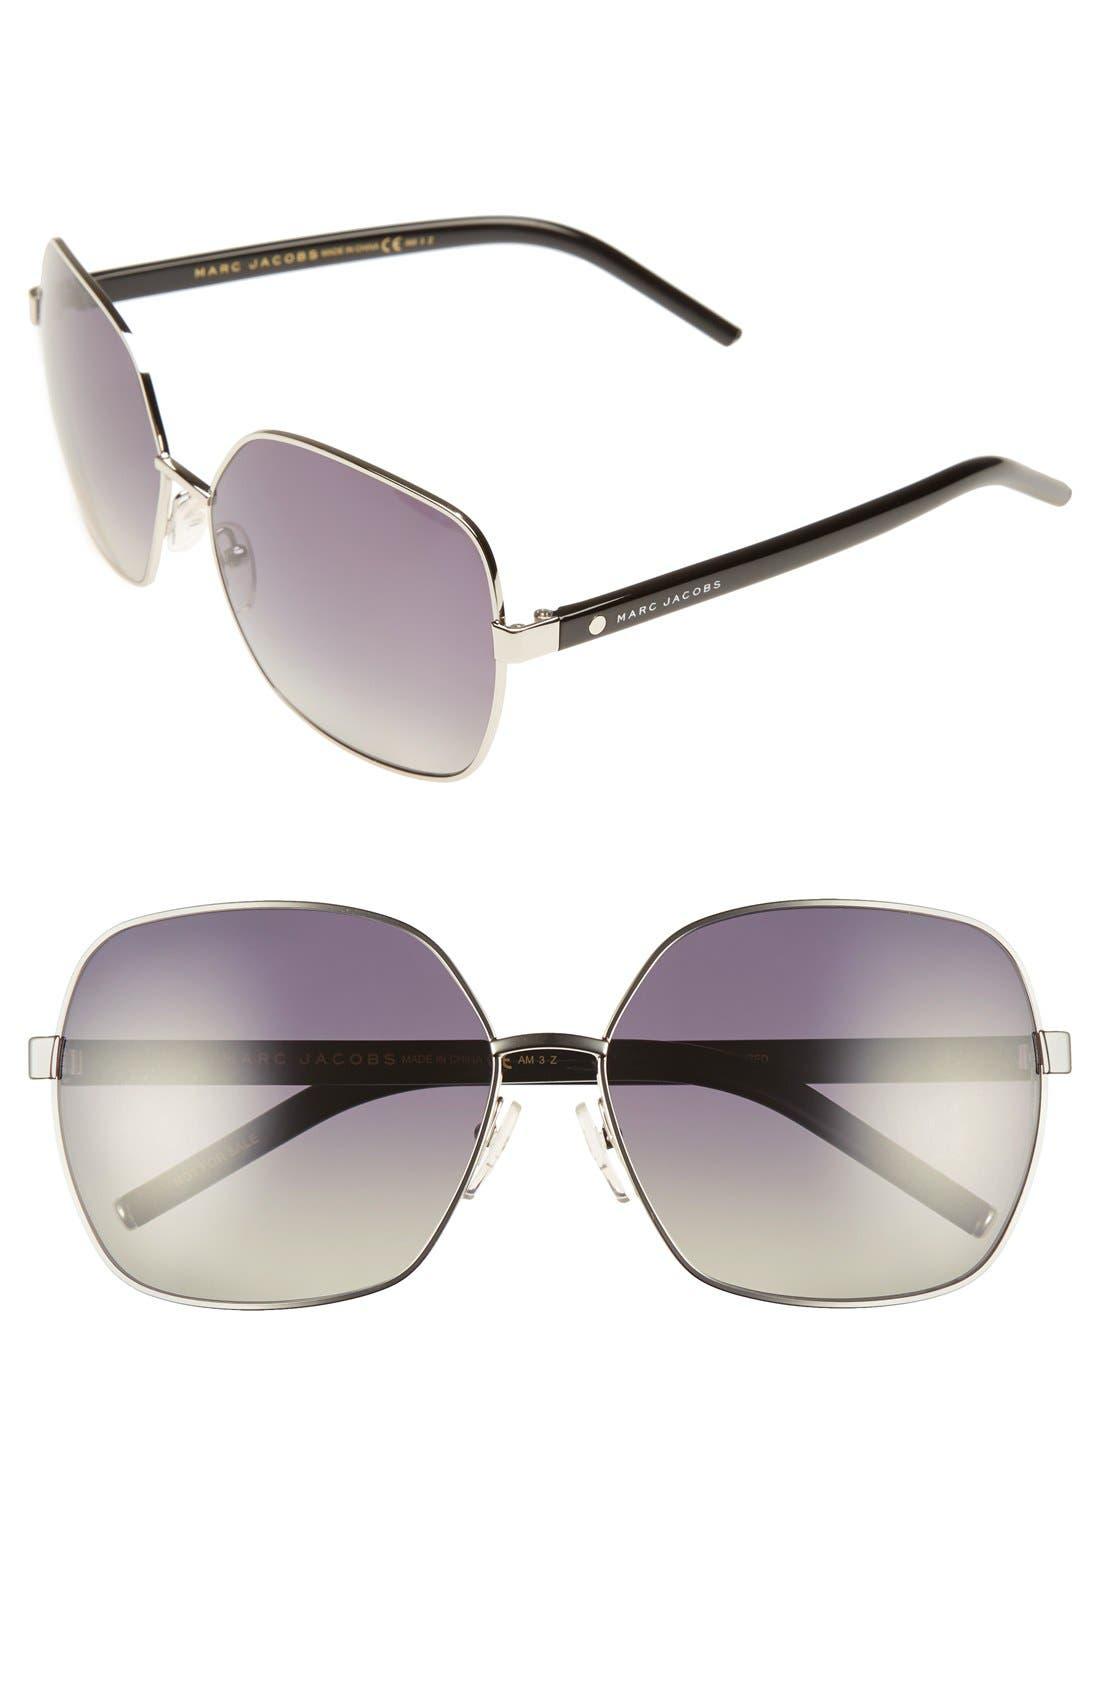 61mm Polarized Oversized Sunglasses,                         Main,                         color, Palladium/ Black